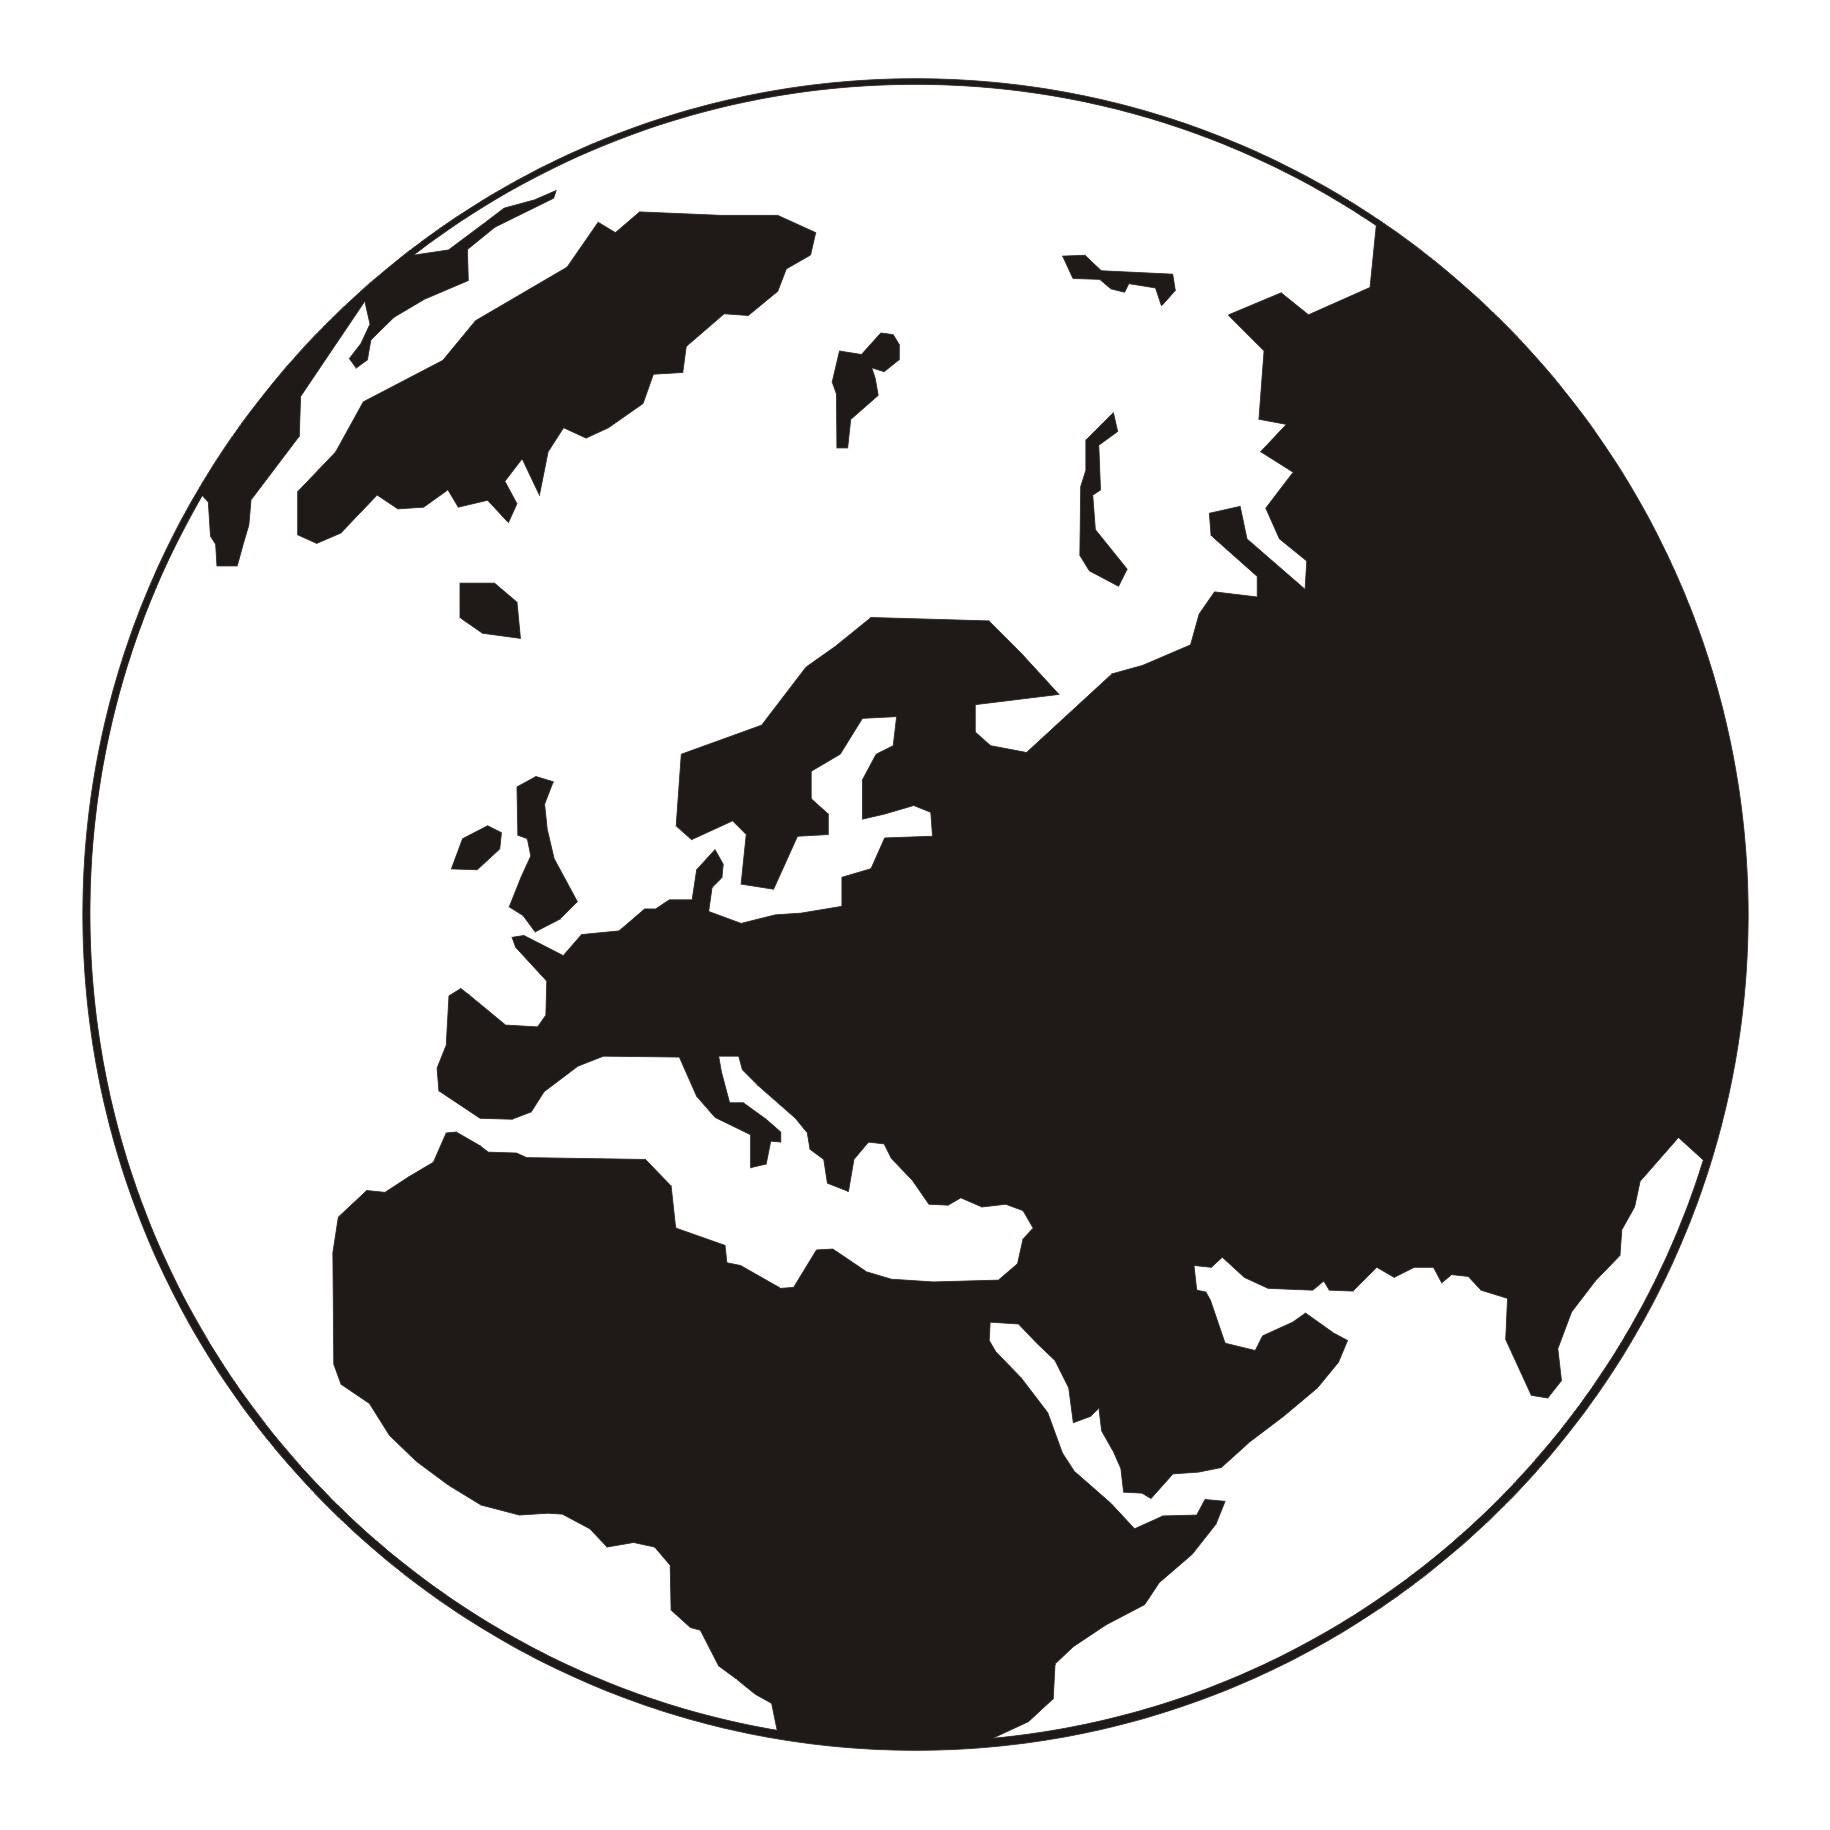 Earth Vector Art - Cliparts.co